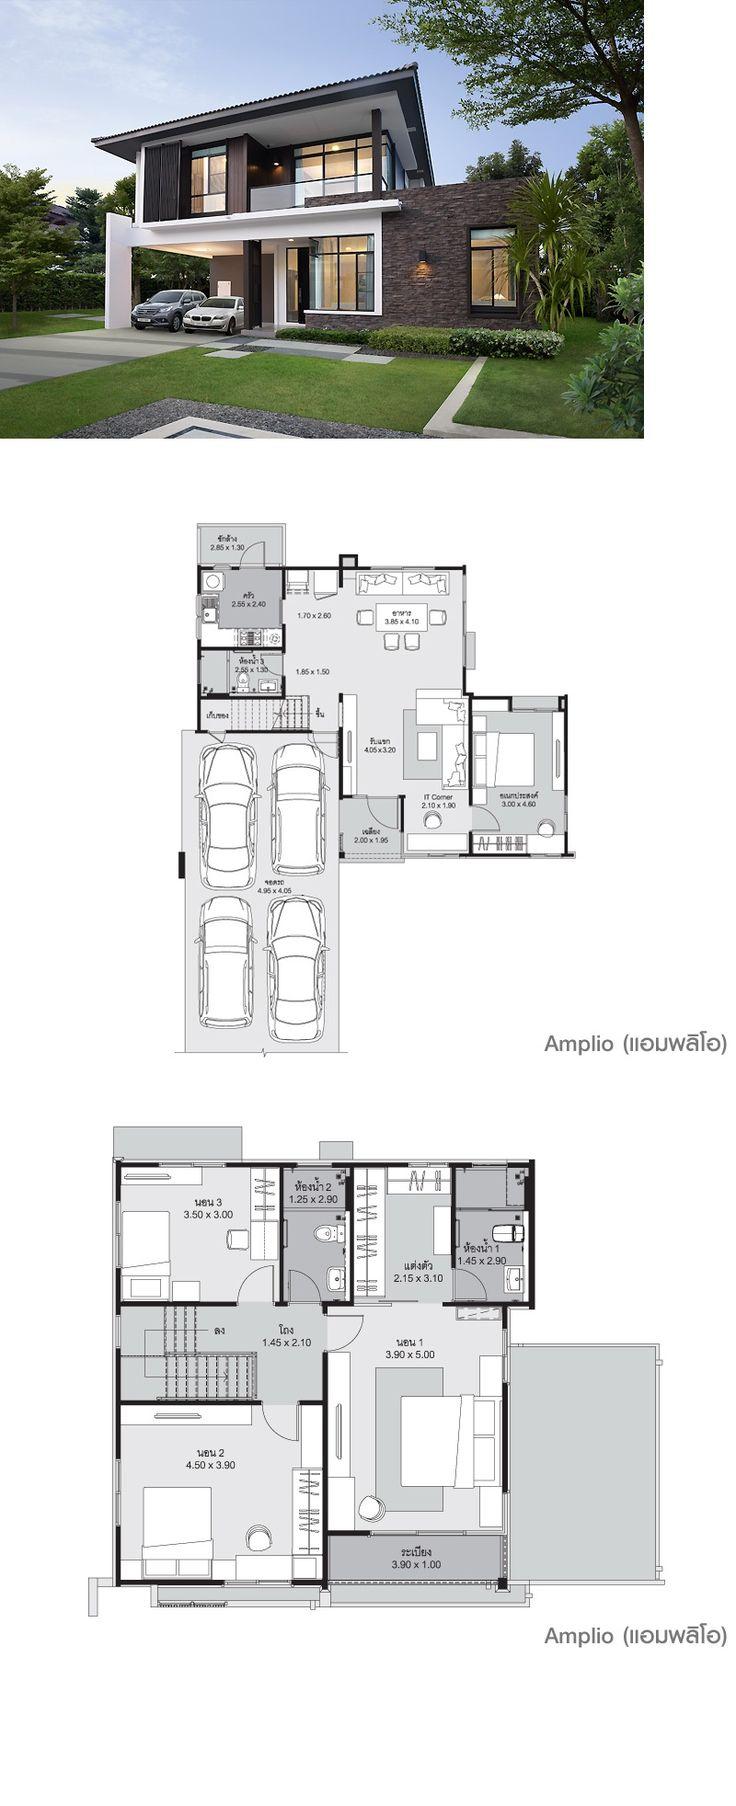 Hauspläne hausfassaden b haus design villa layout erdgeschoss gehäuse zuhause